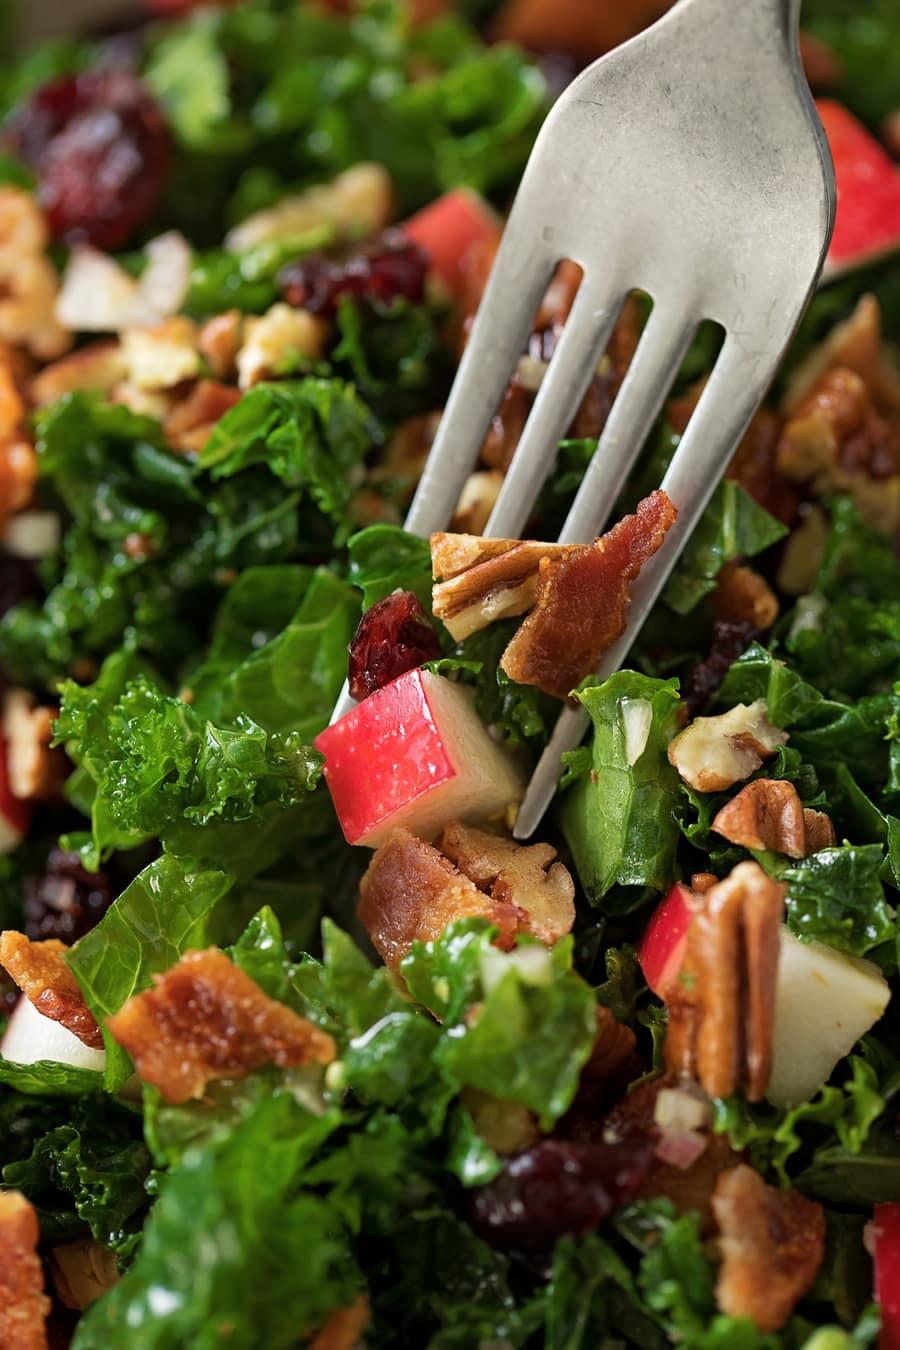 Kale Salad with Cranberries